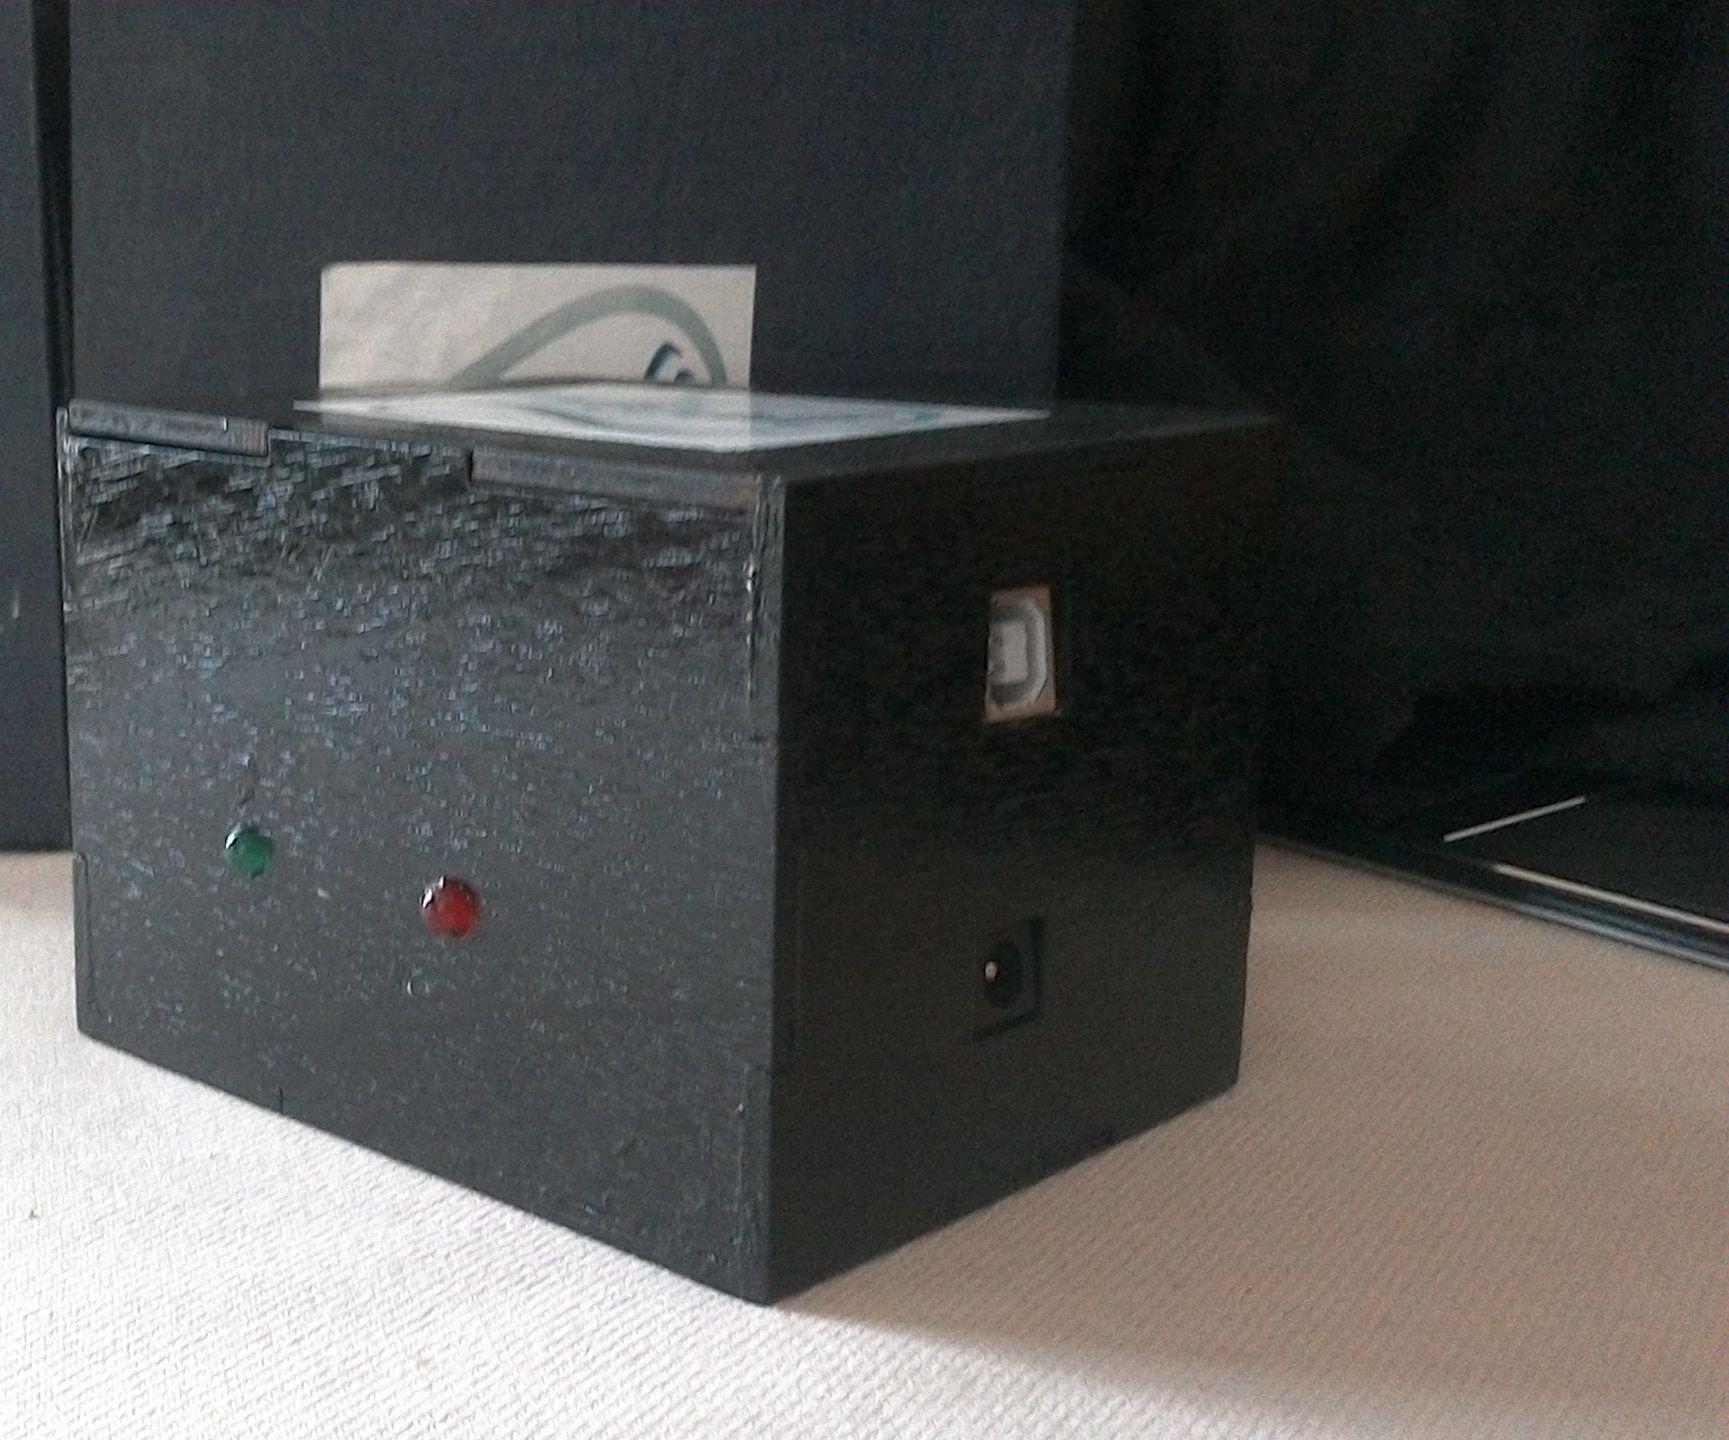 Mutligas Detector (i-butane, Propane, Methane, Alcohol, Hydrogen and Smoke)